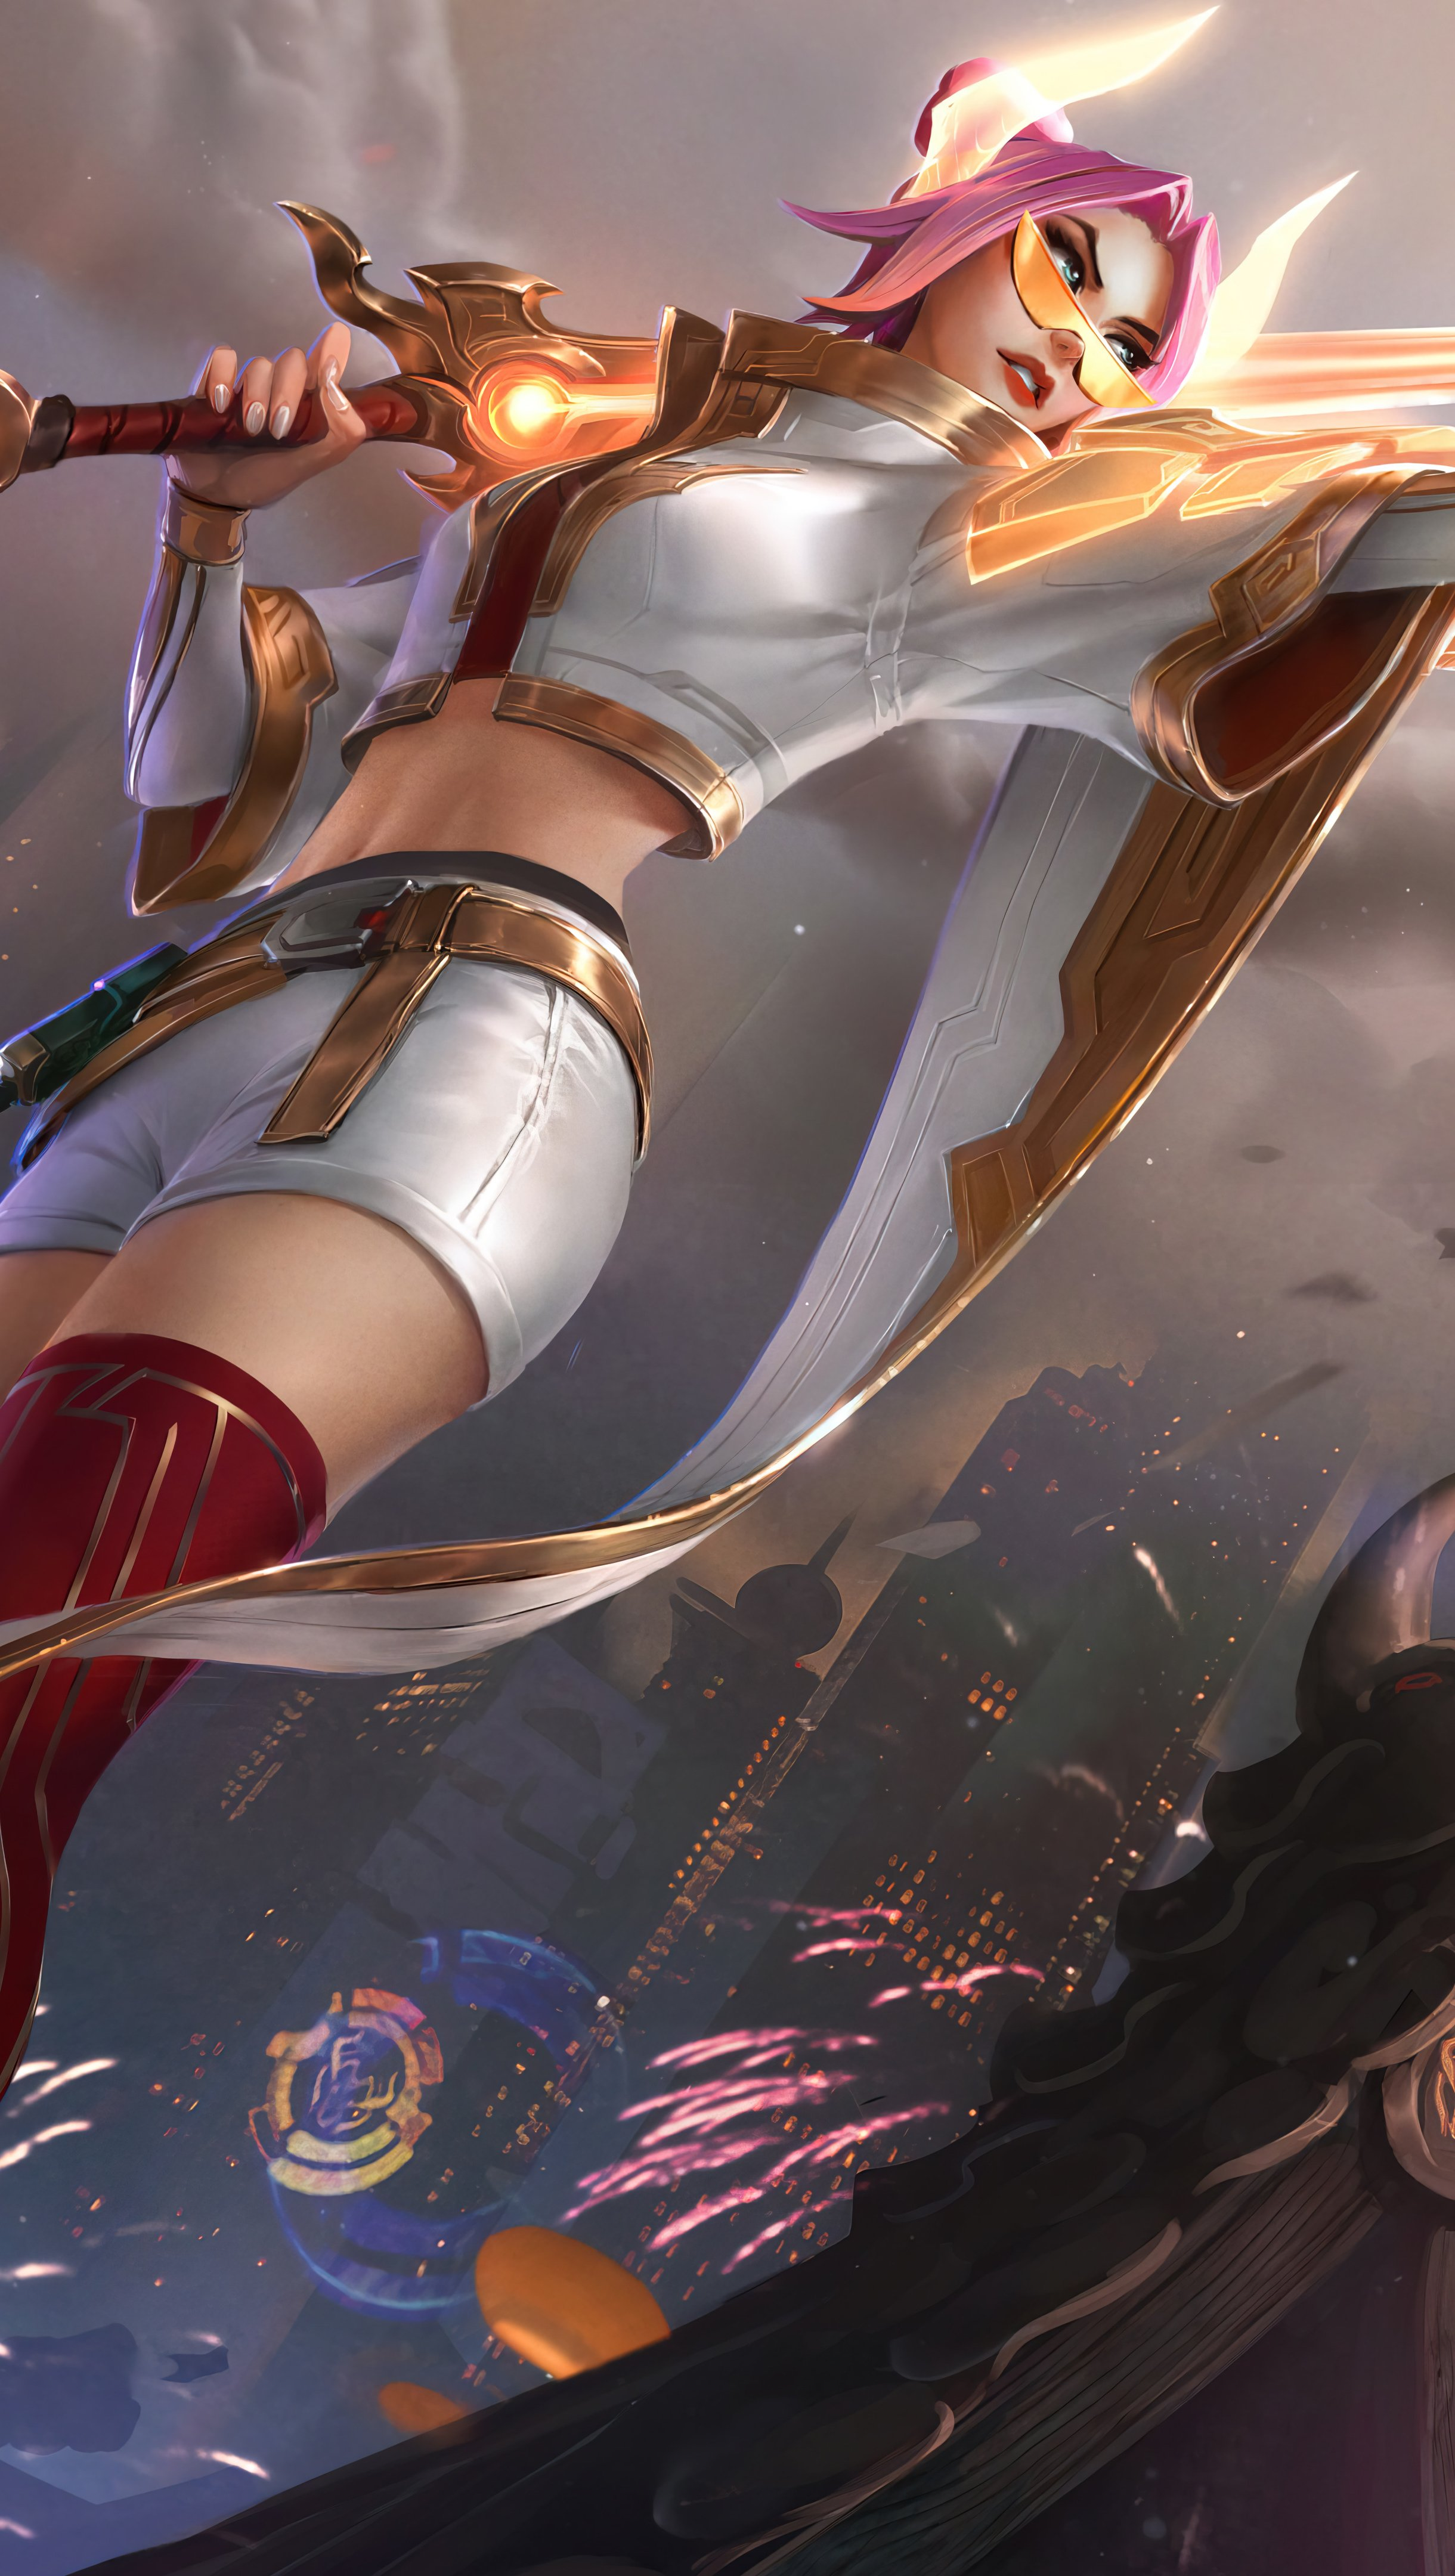 Fondos de pantalla Fiora de League of Legends Vertical